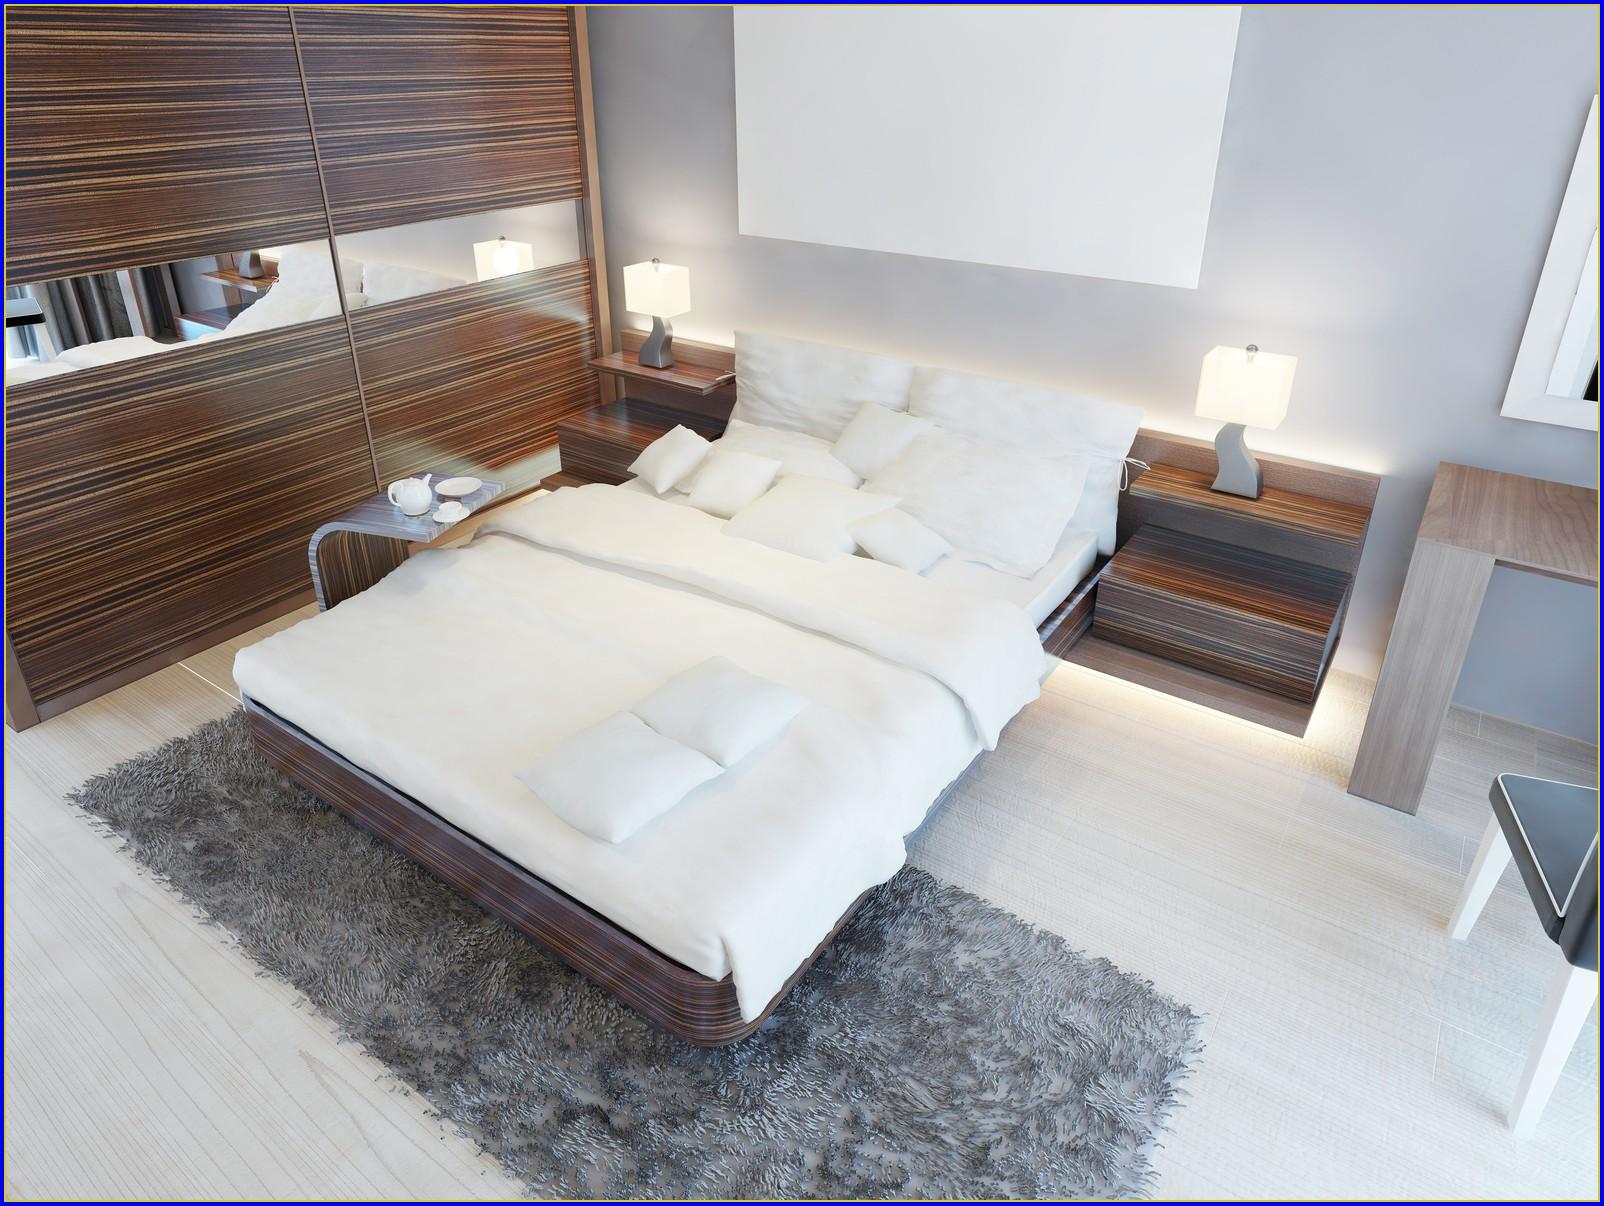 Dänische Bettenlager